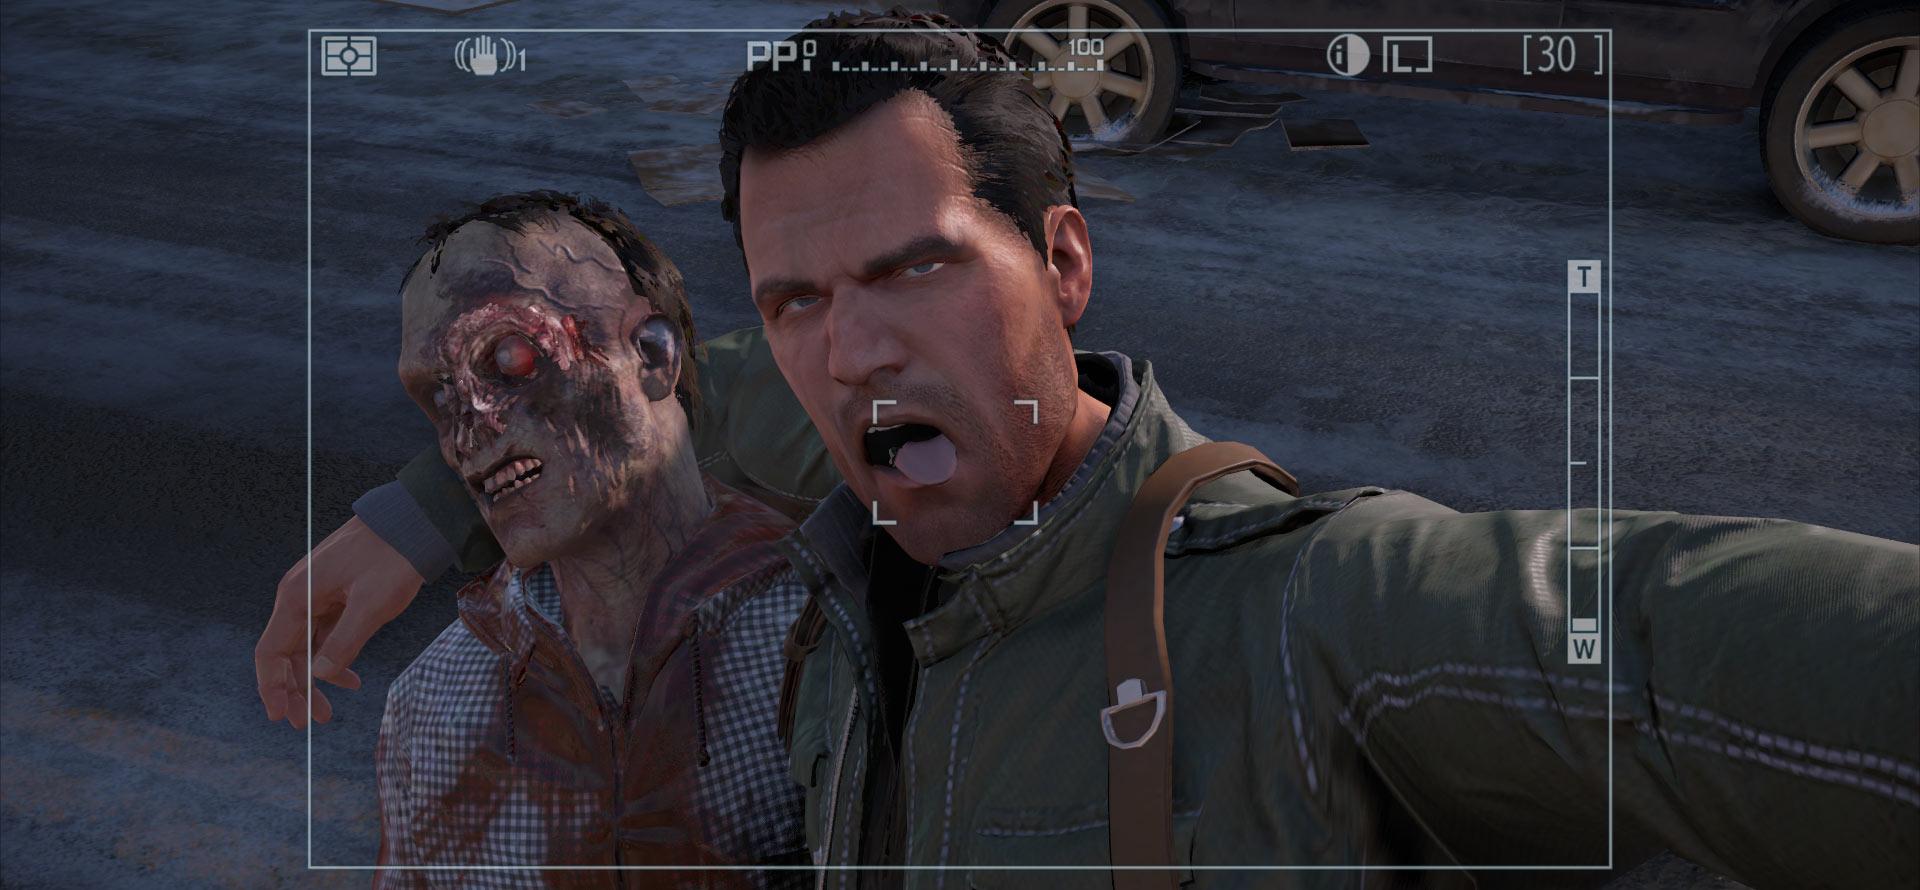 Dead Rising 4 (E3 2016) - YouTube